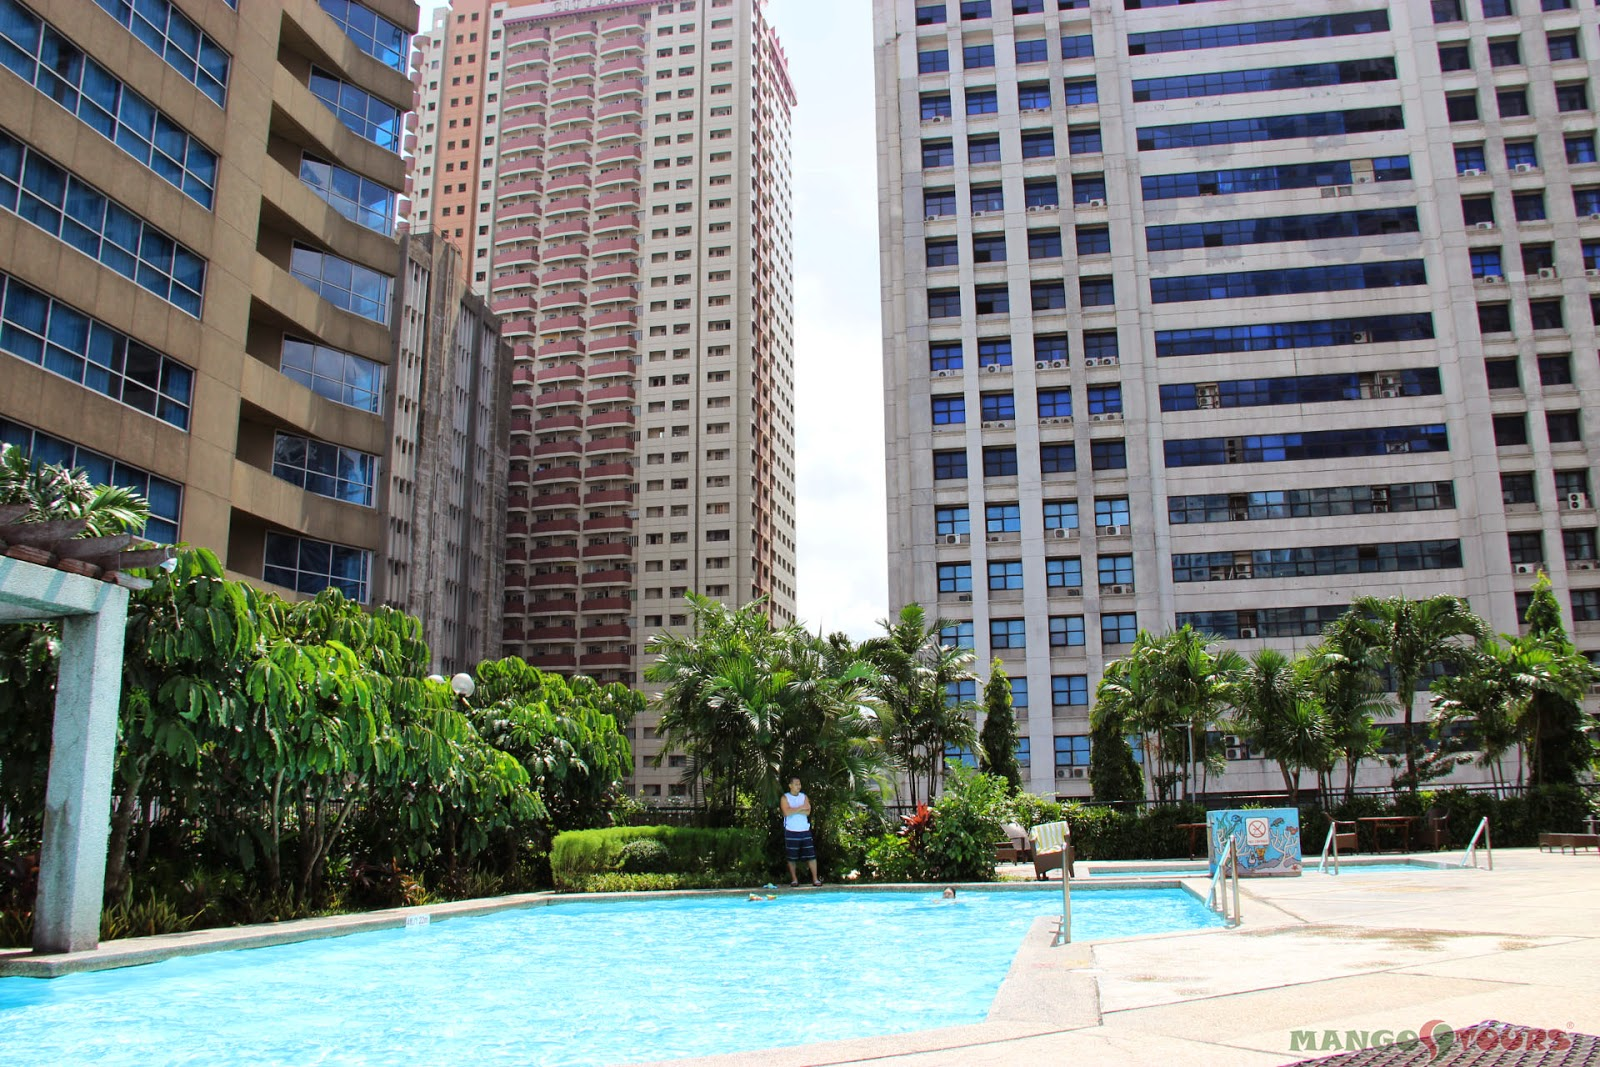 Mango Tours Holiday Inn Manila Galleria Philippines